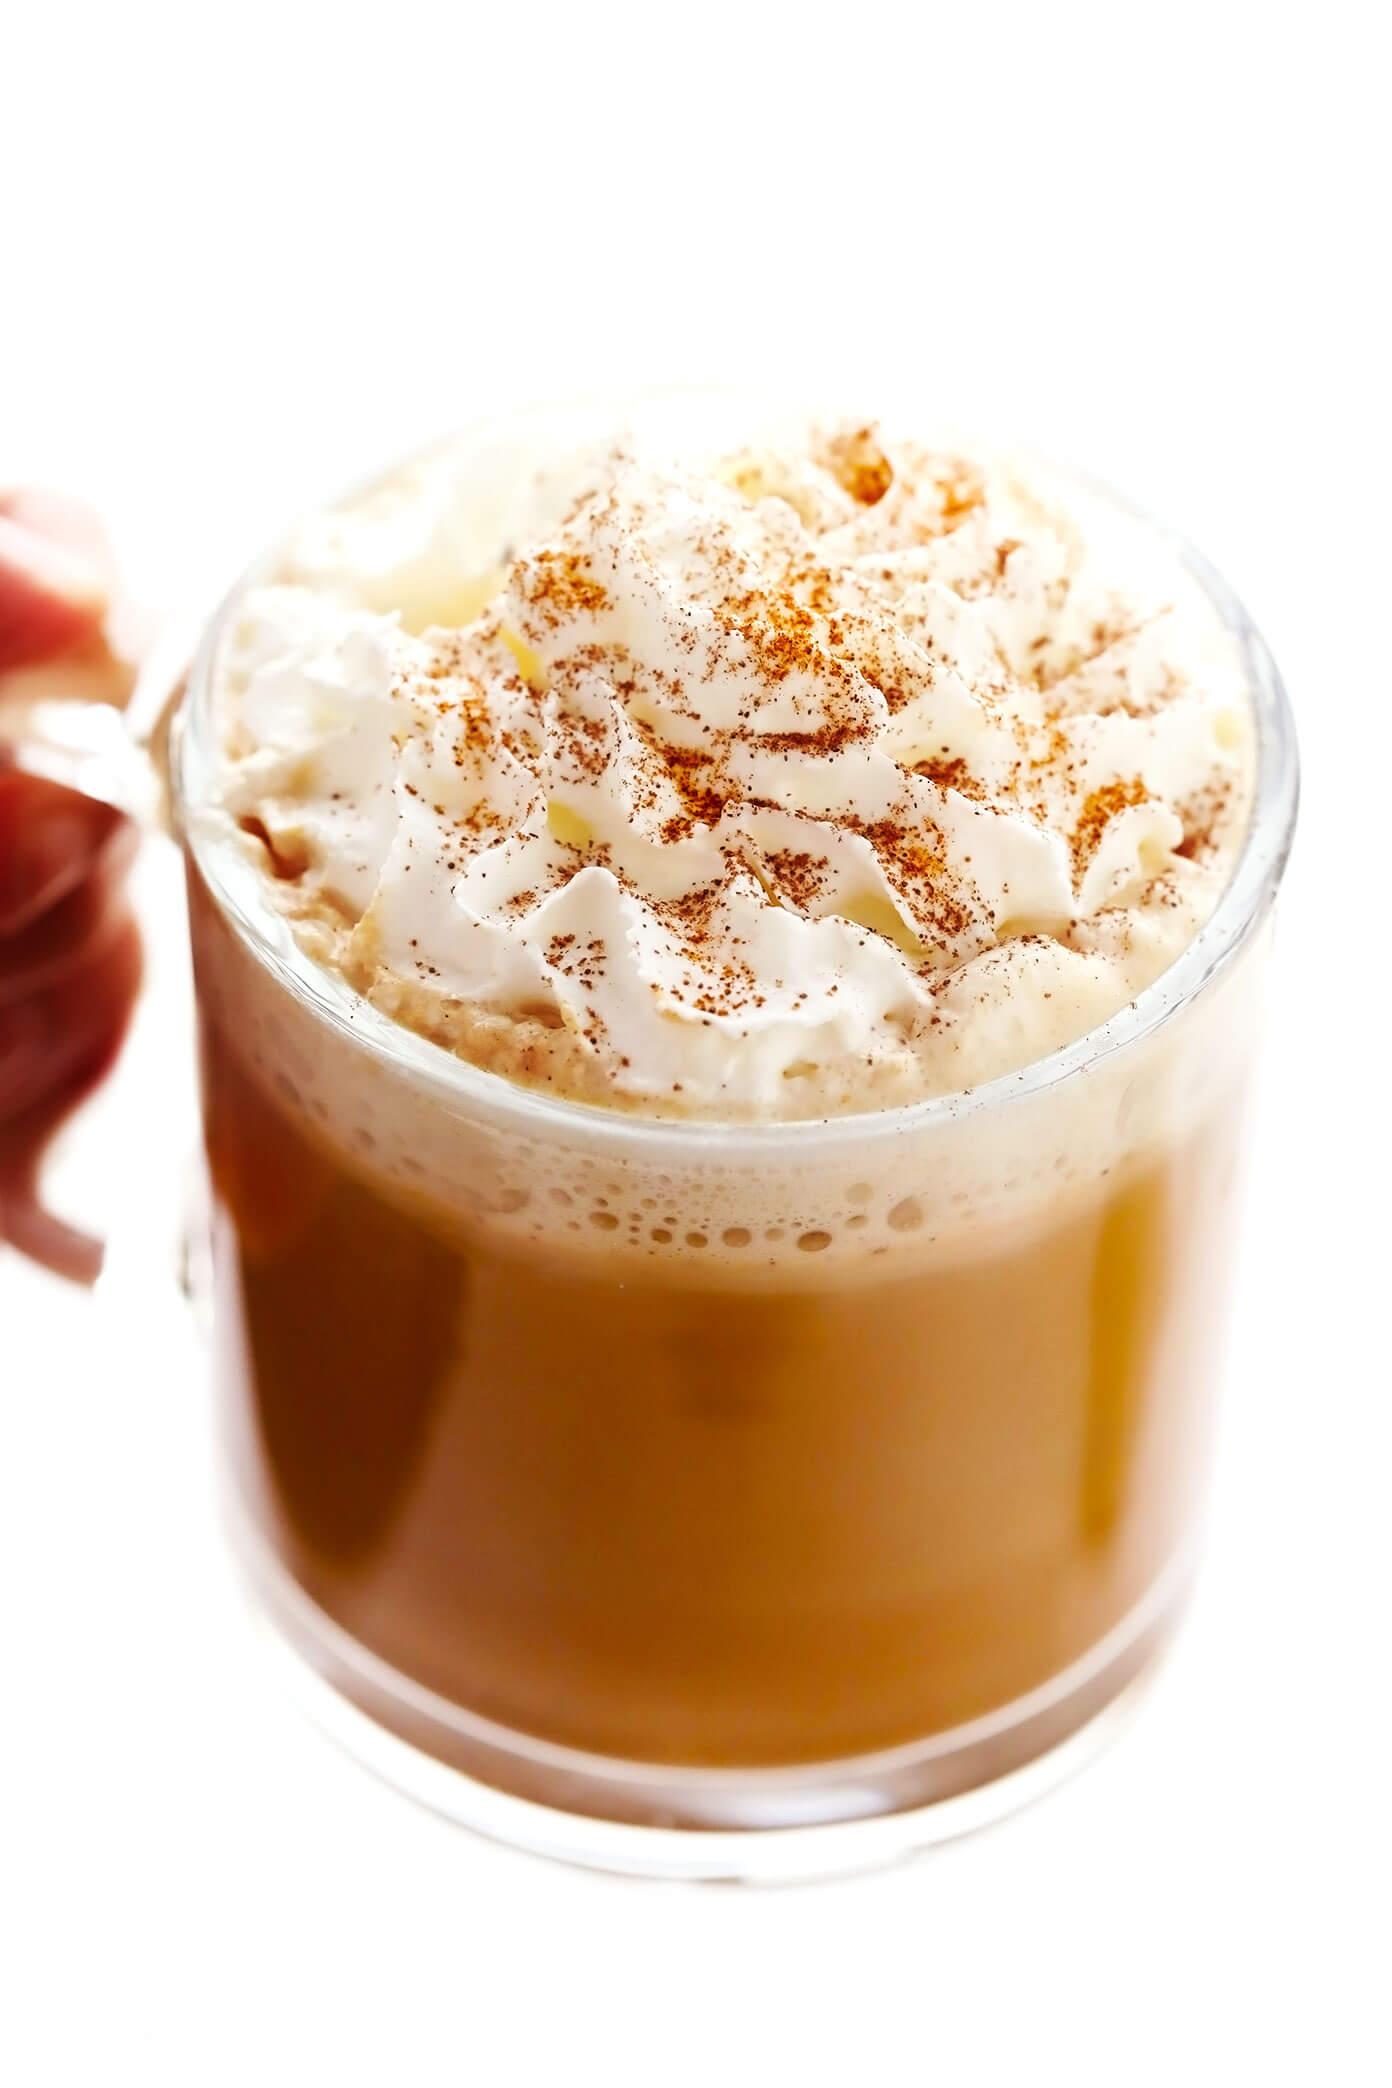 Mug of Pumpkin Spice Latte